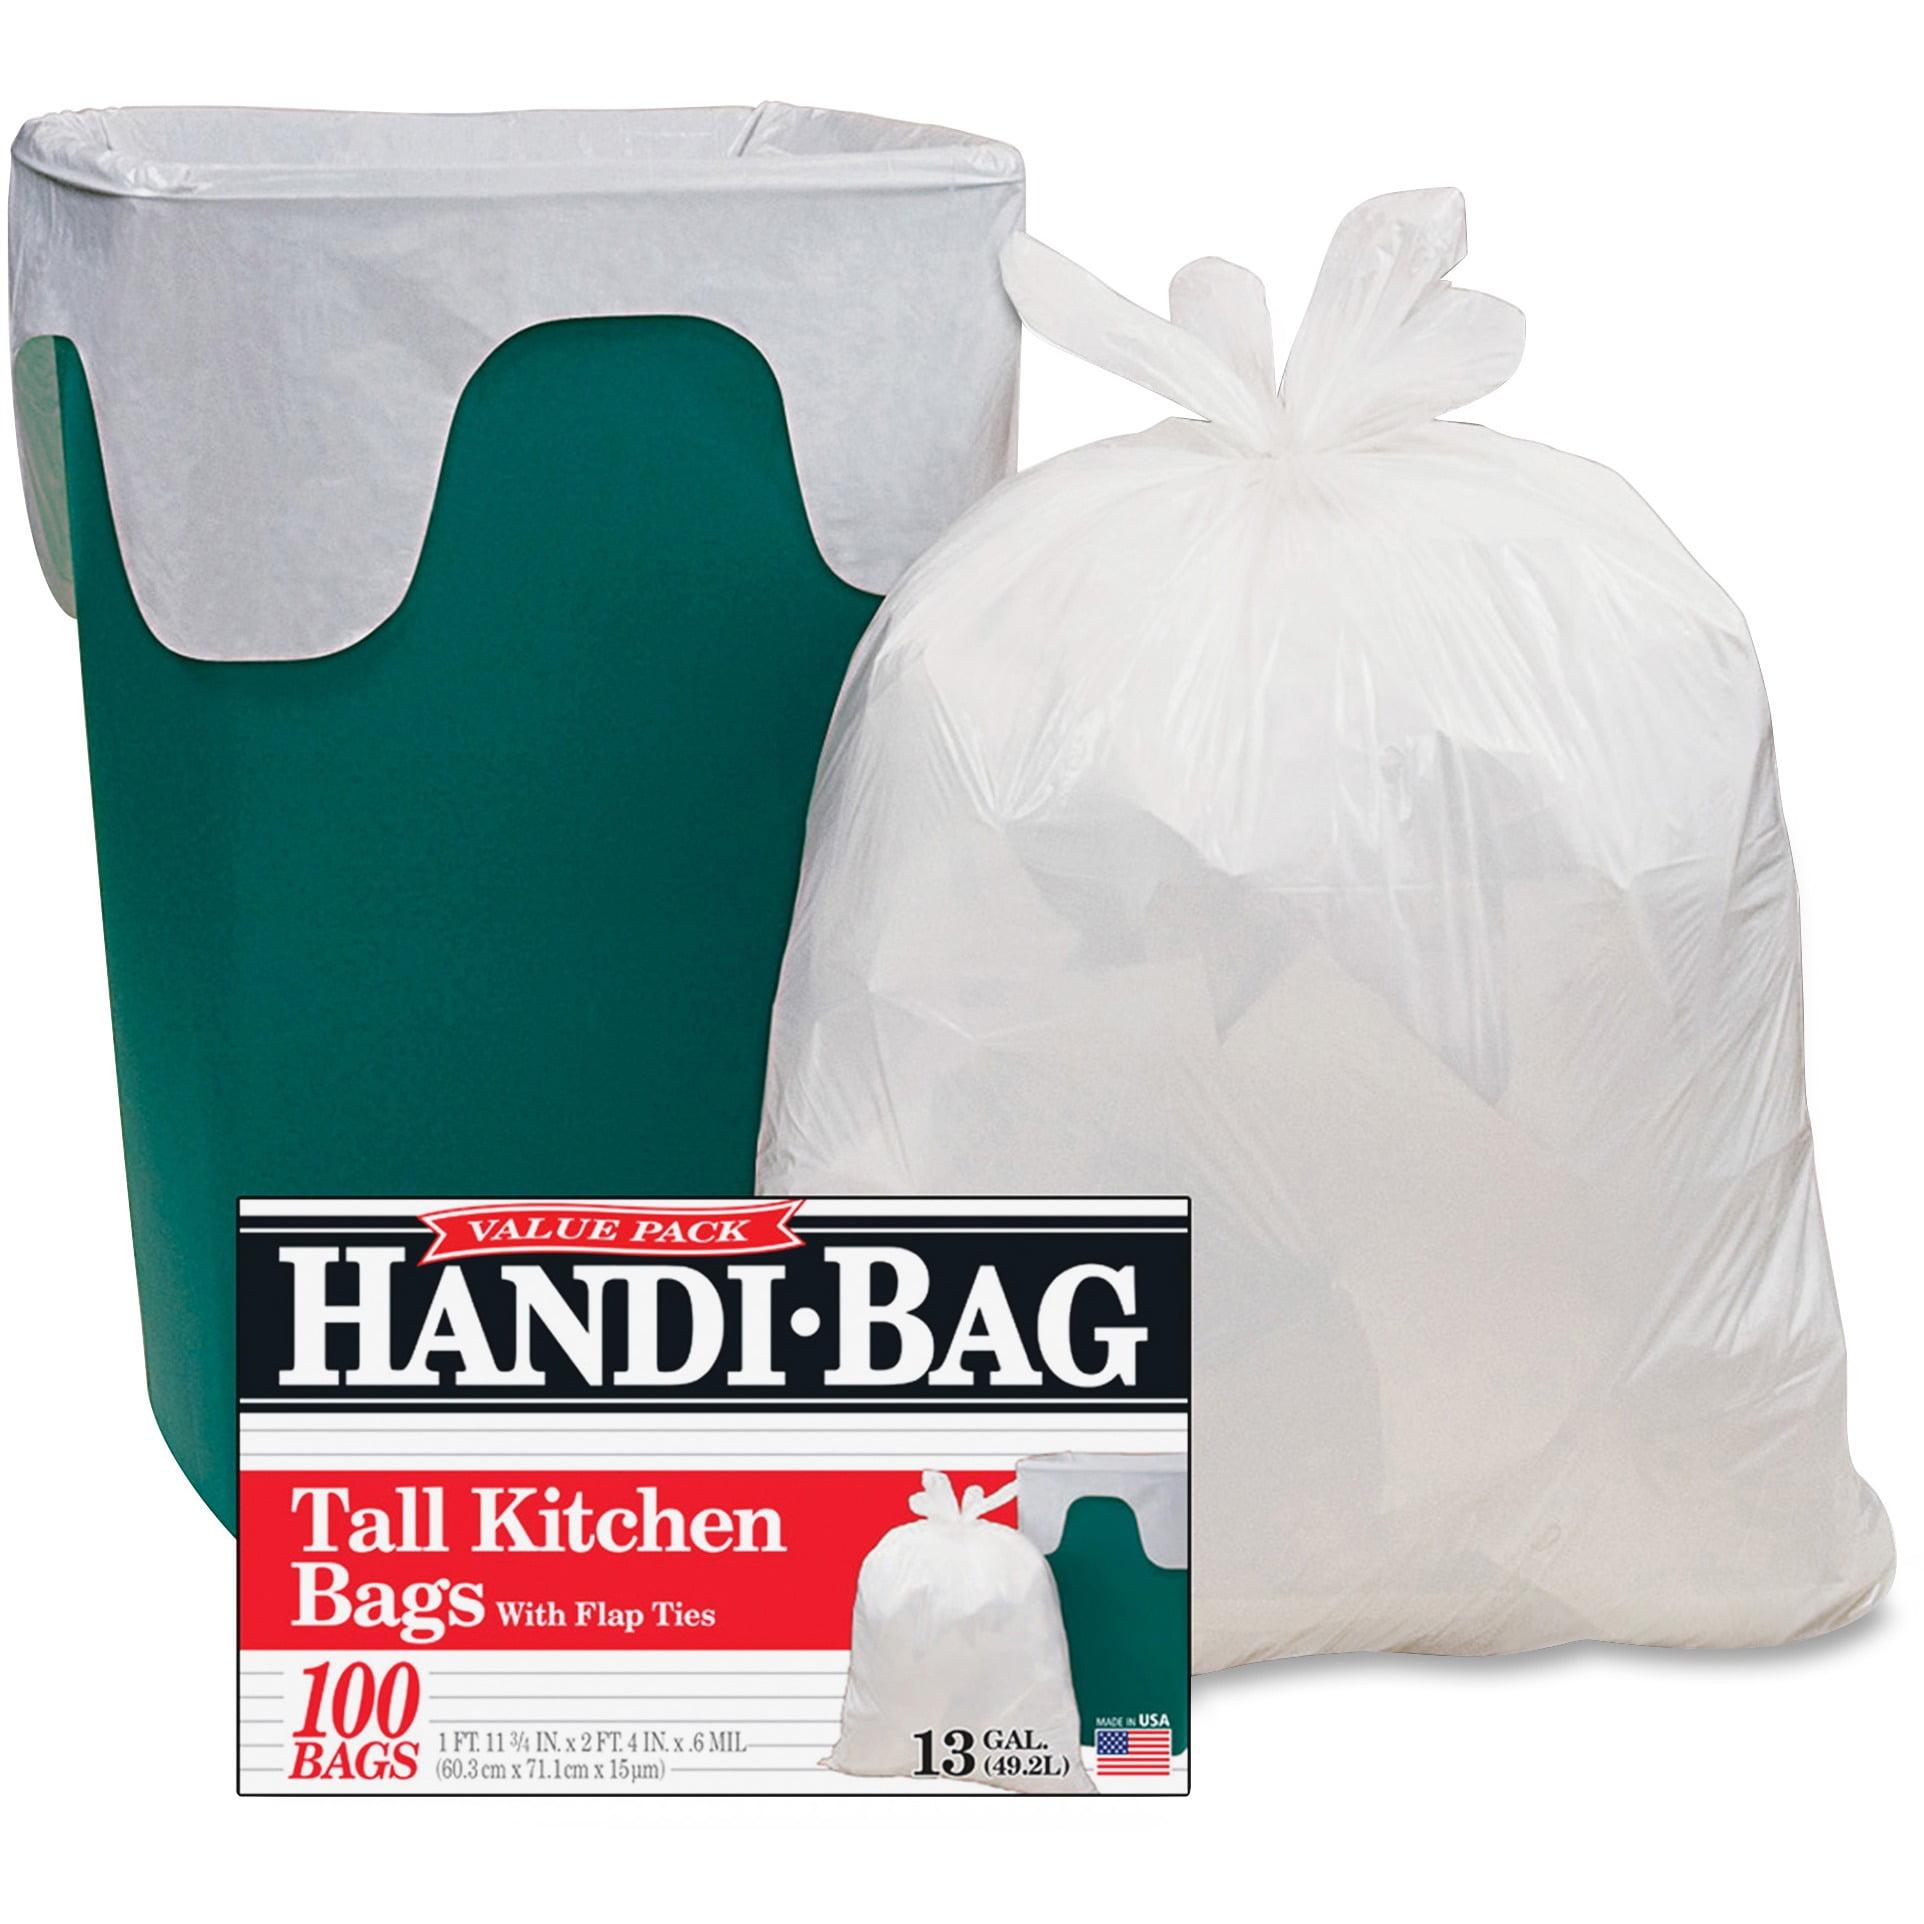 Webster, WBIHAB6FK100, Handi-Bag Flap Tie Tall Kitchen Bags, 100 / Box, White, 13 gal